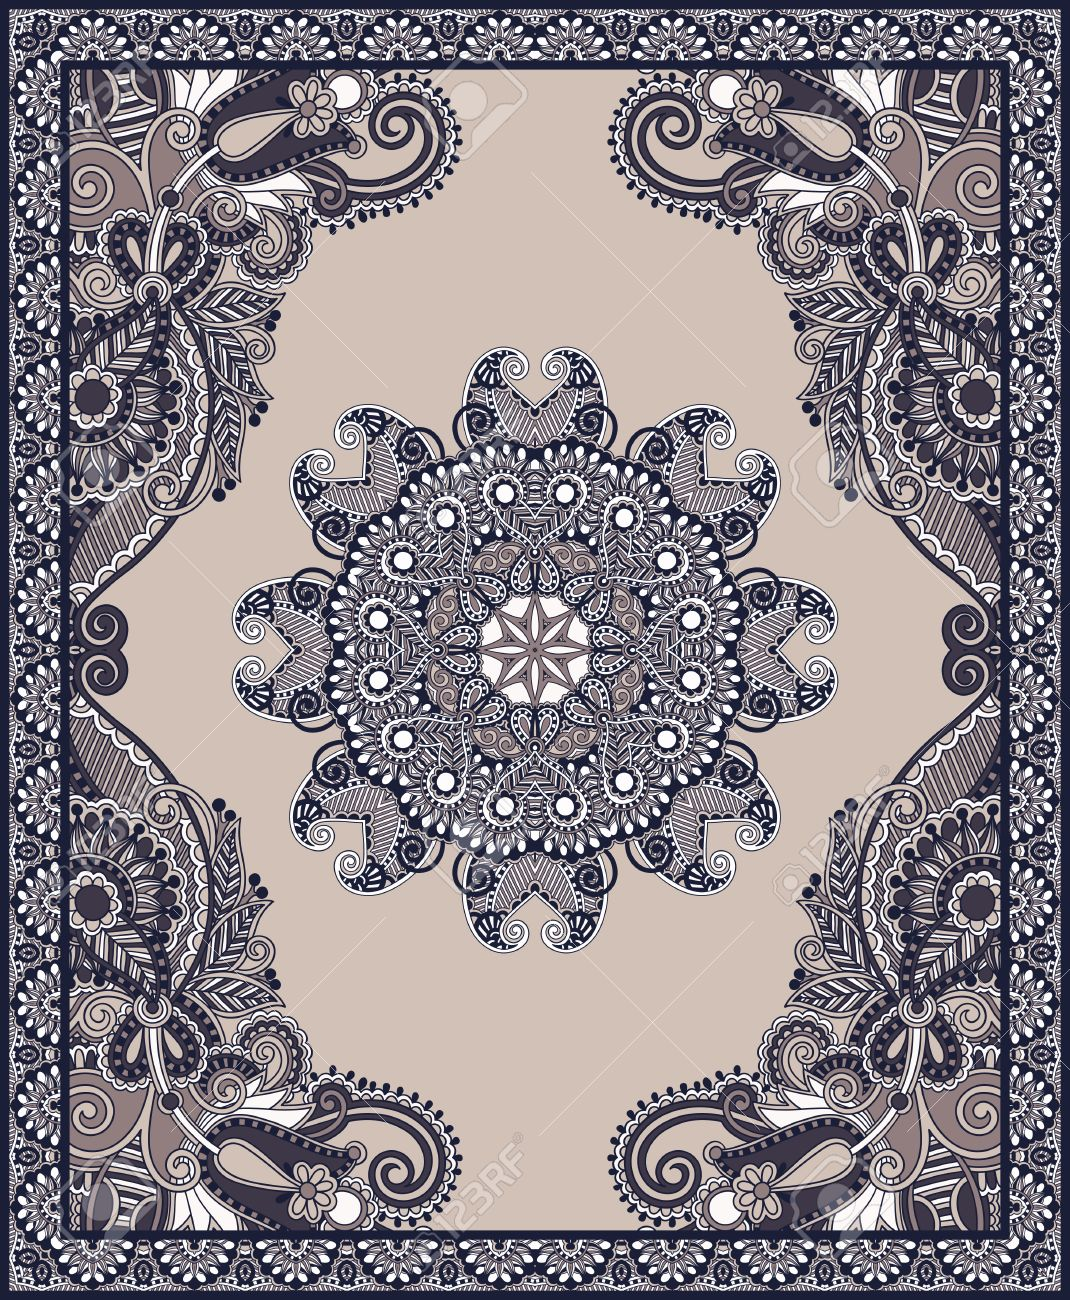 Ukrainian Oriental Floral Ornamental Carpet Design Stock Vector - 18016486